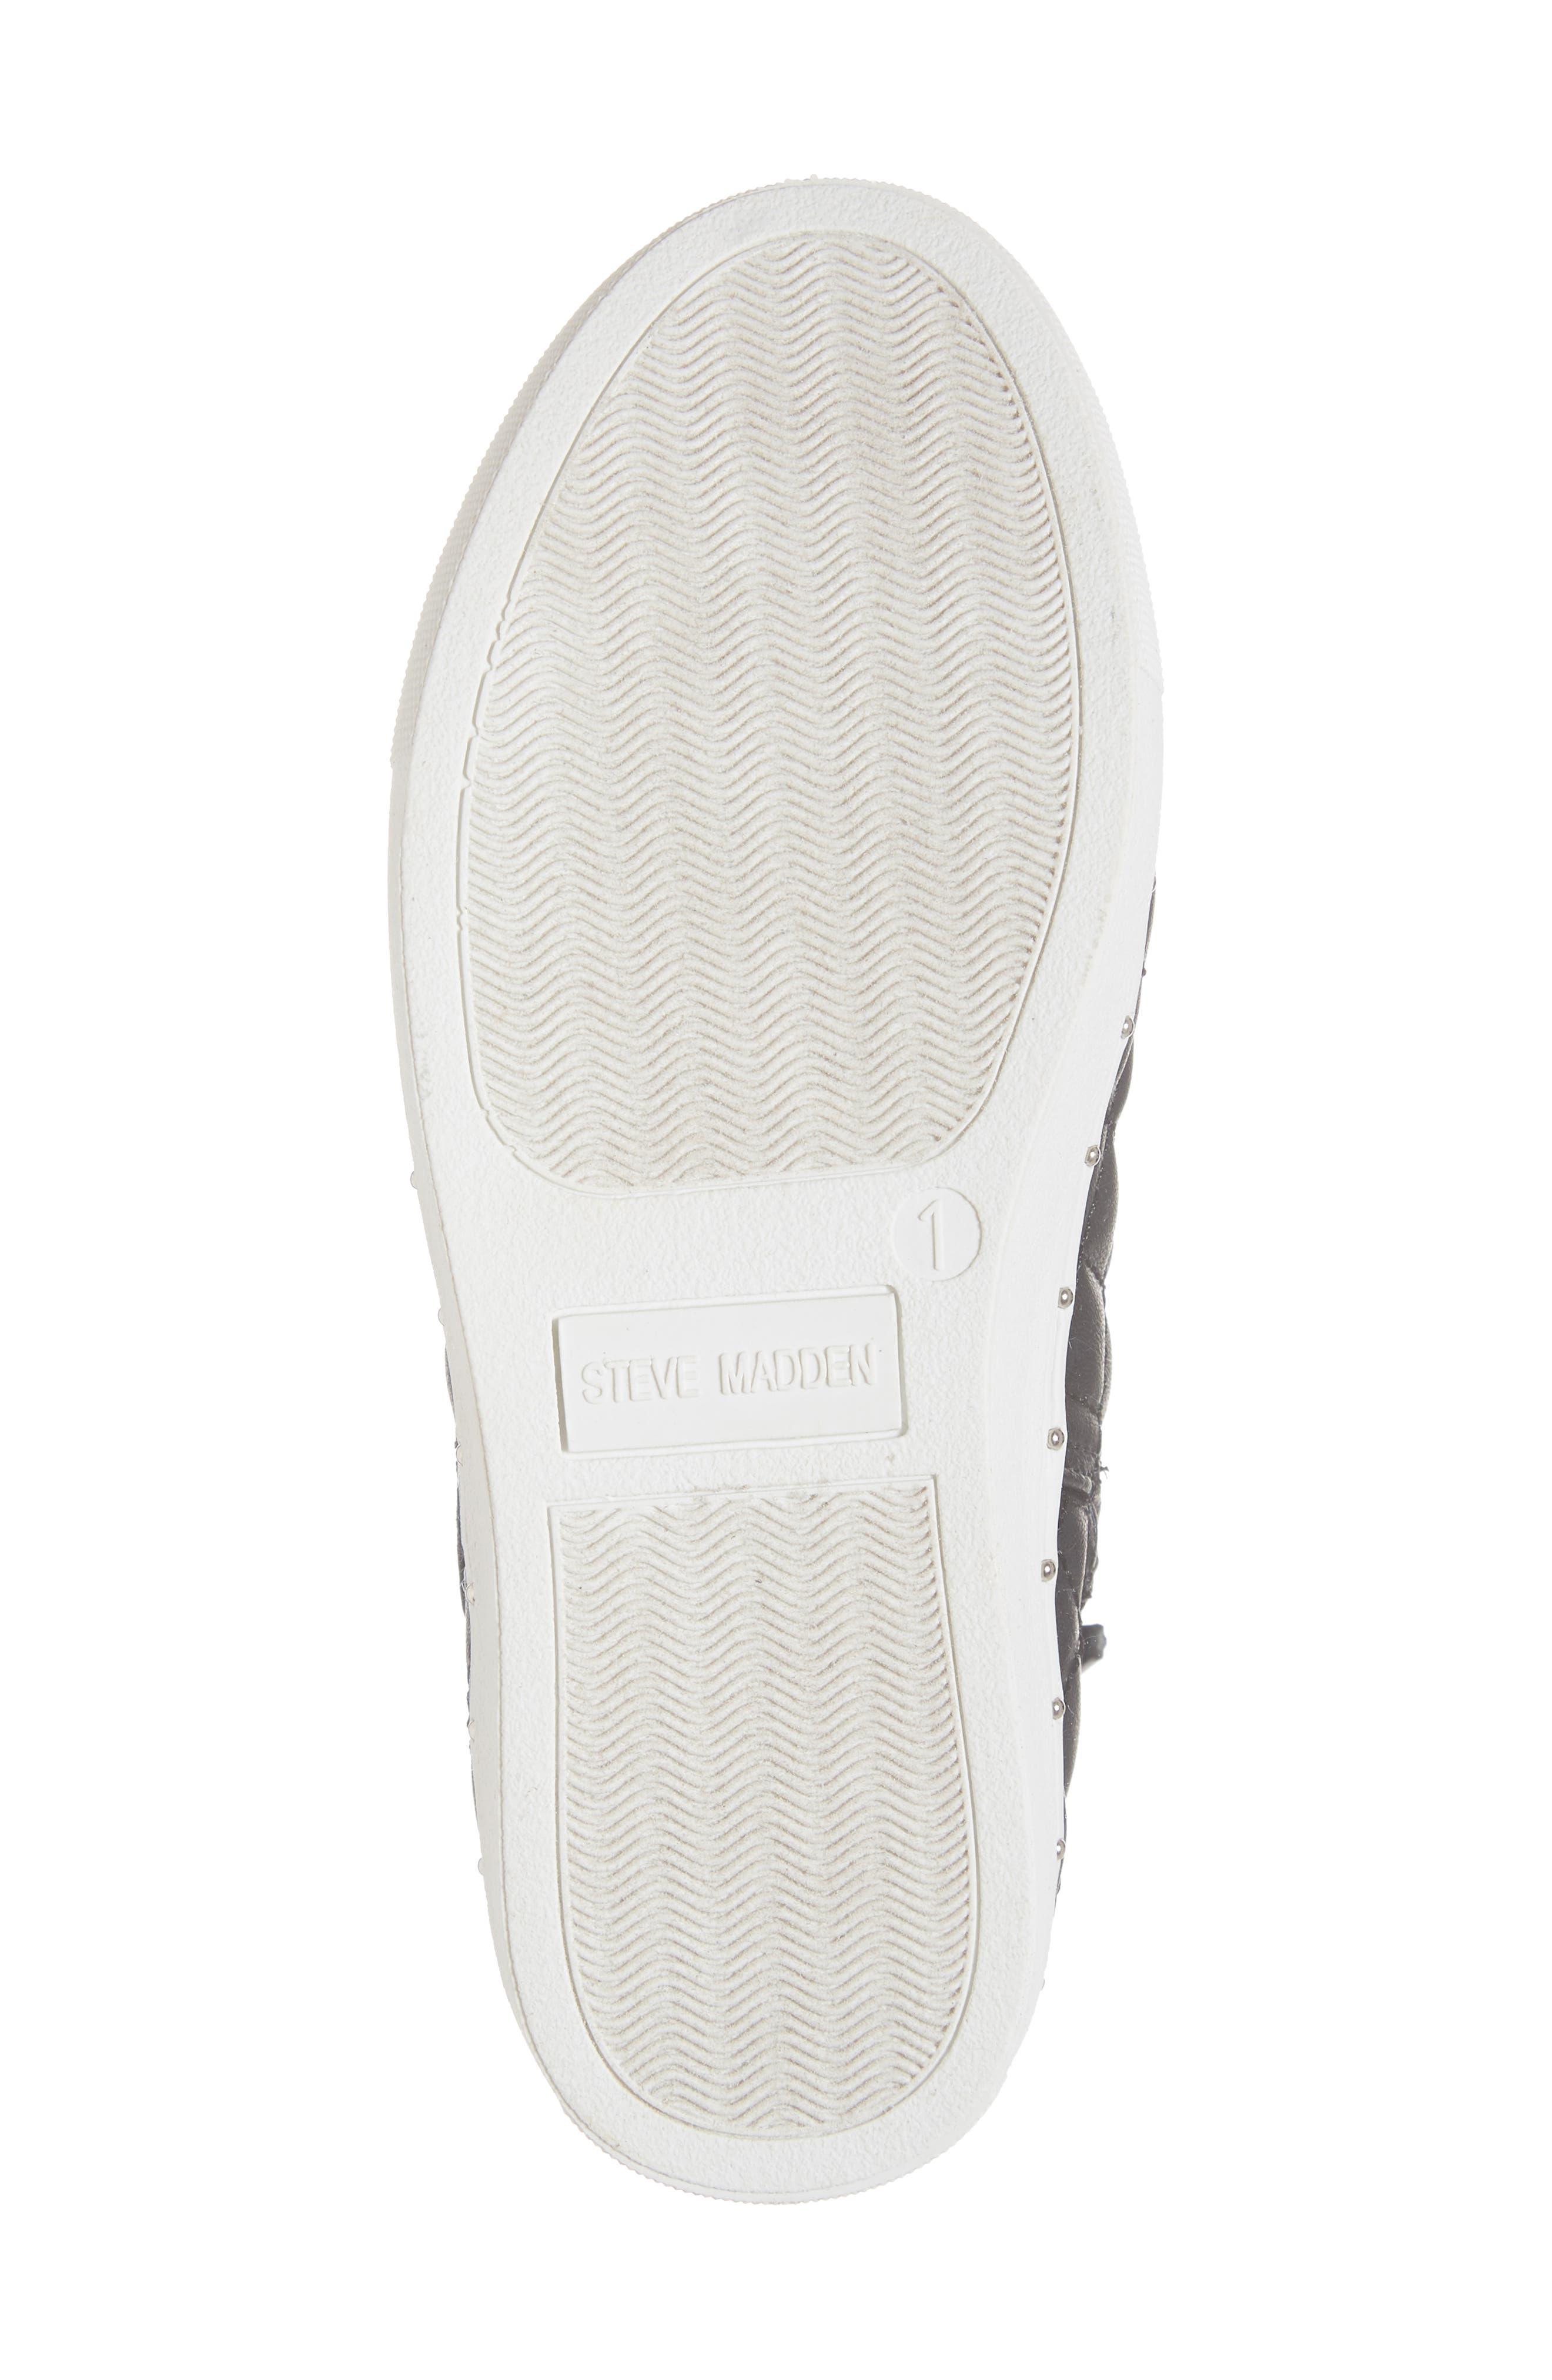 JQuest High Top Platform Sneaker,                             Alternate thumbnail 6, color,                             BLACK